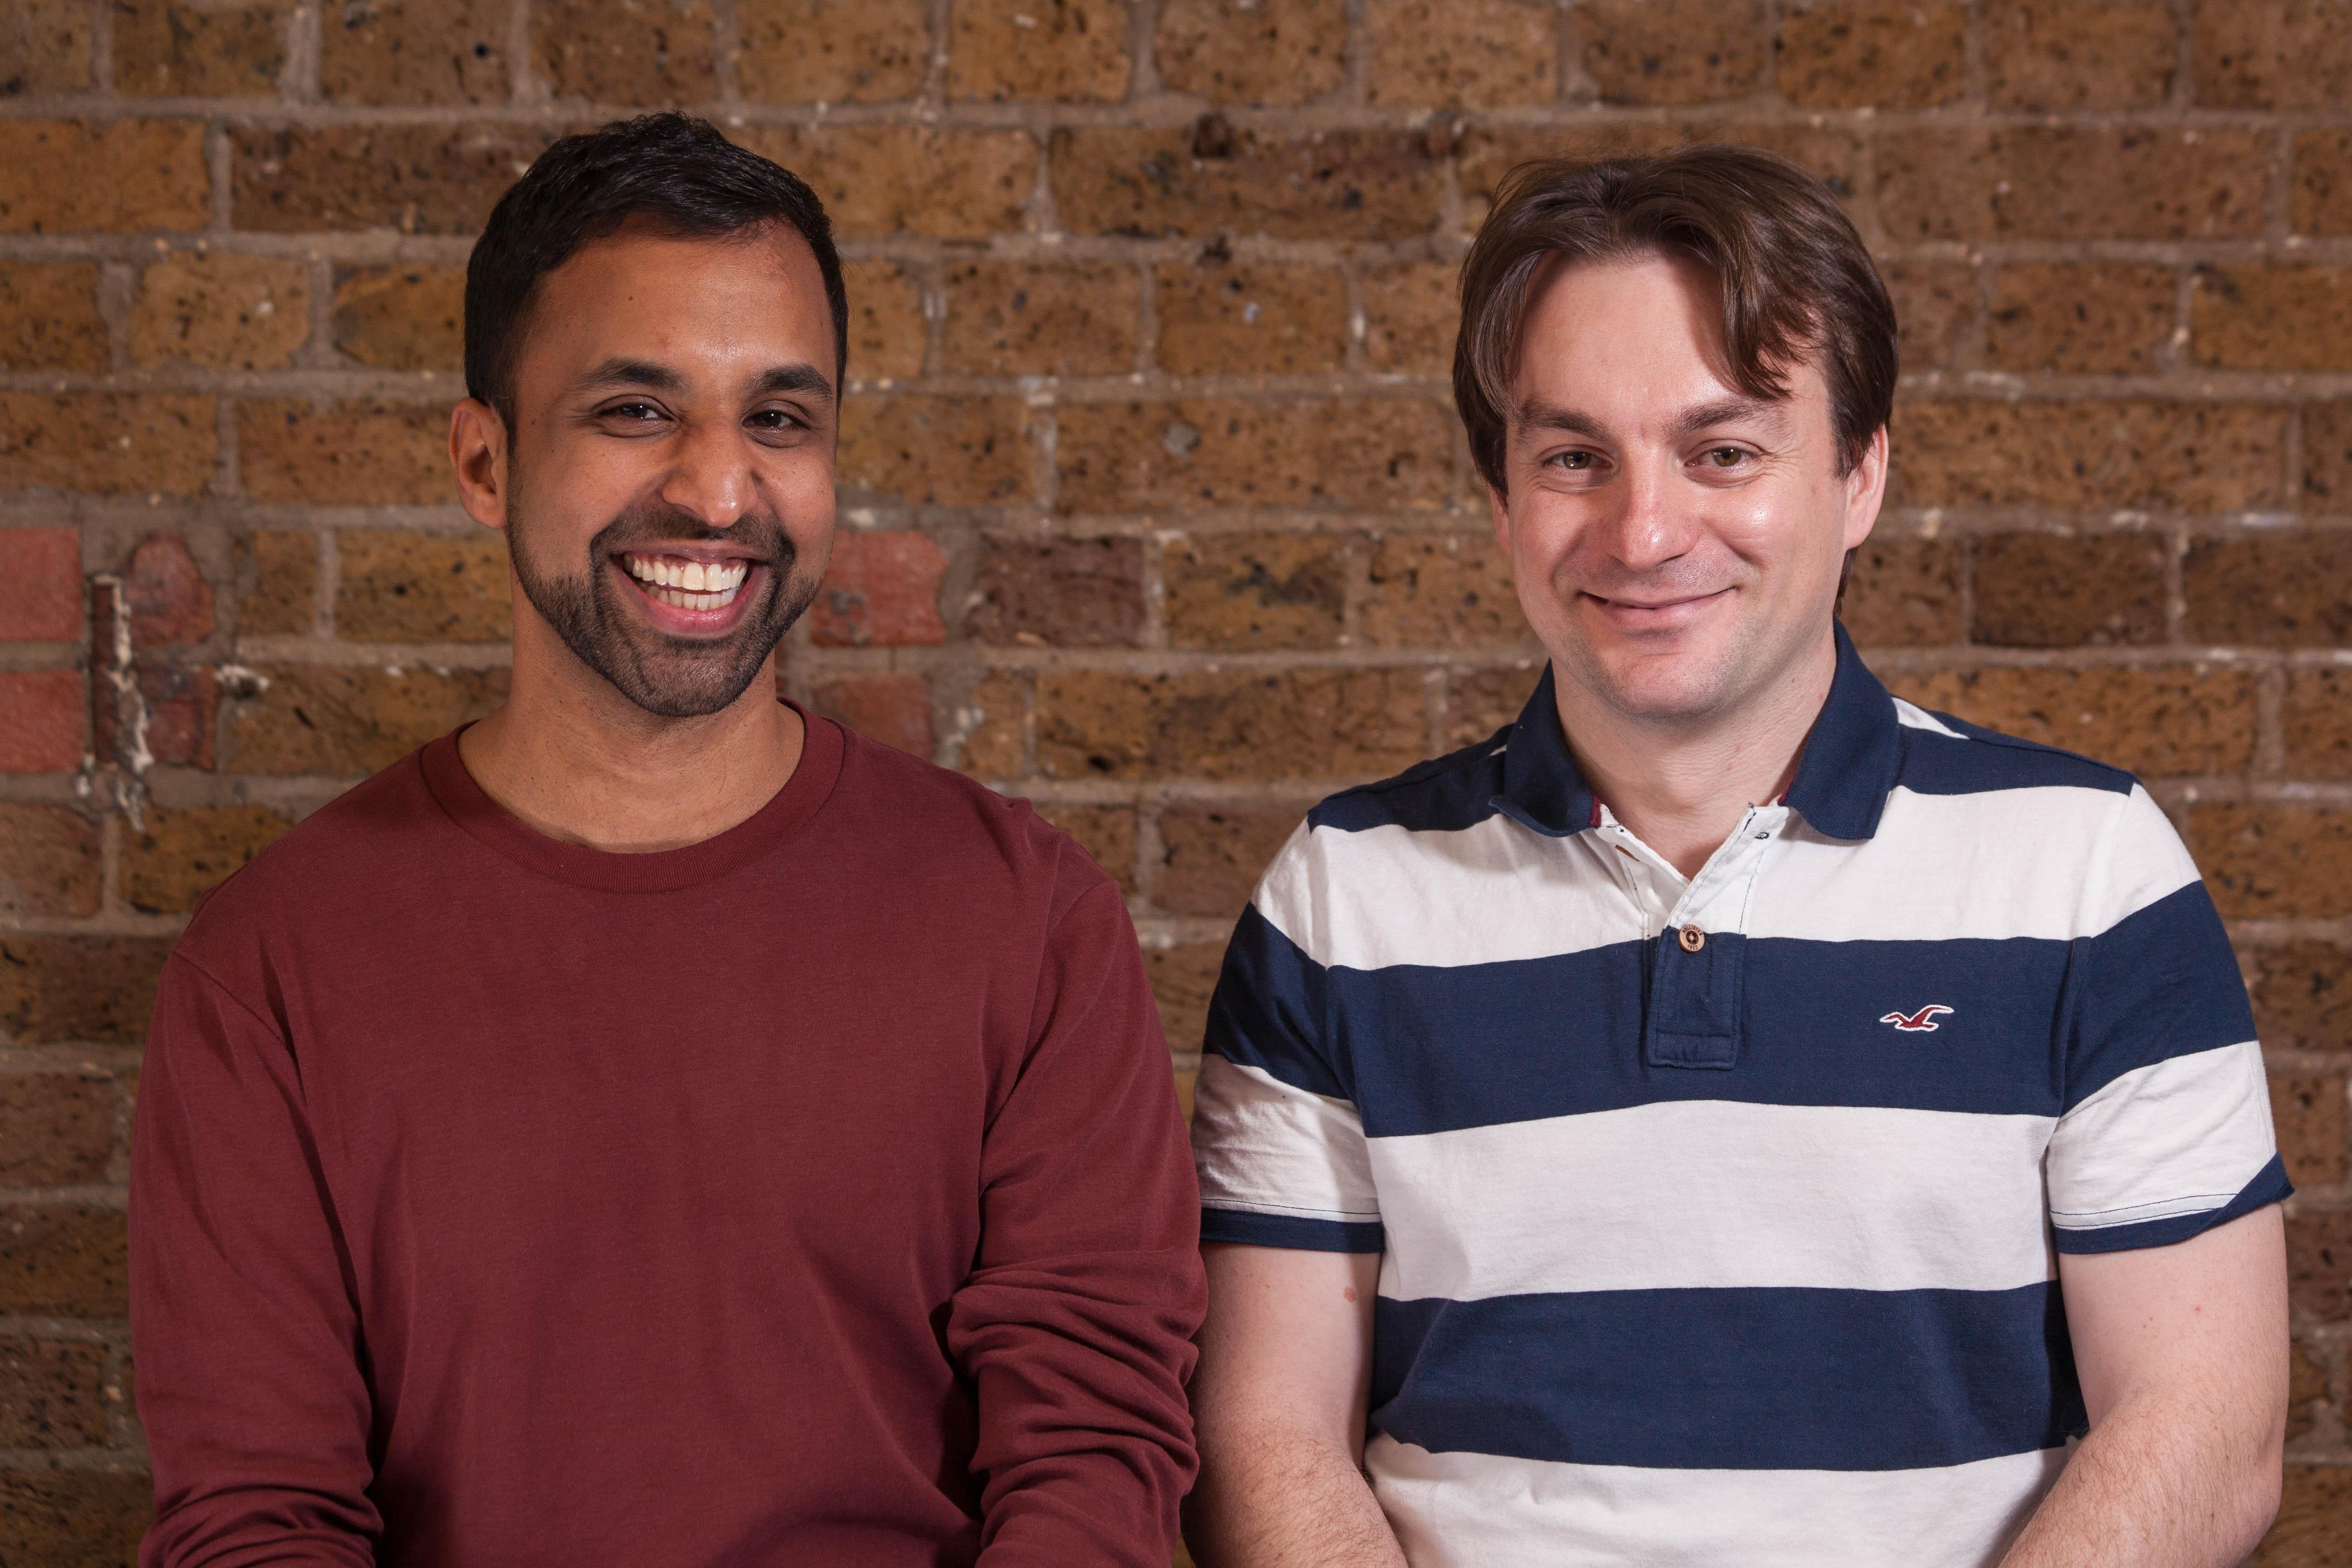 Alphabet venture arm GV backs UK machine-learning start-up nPlan